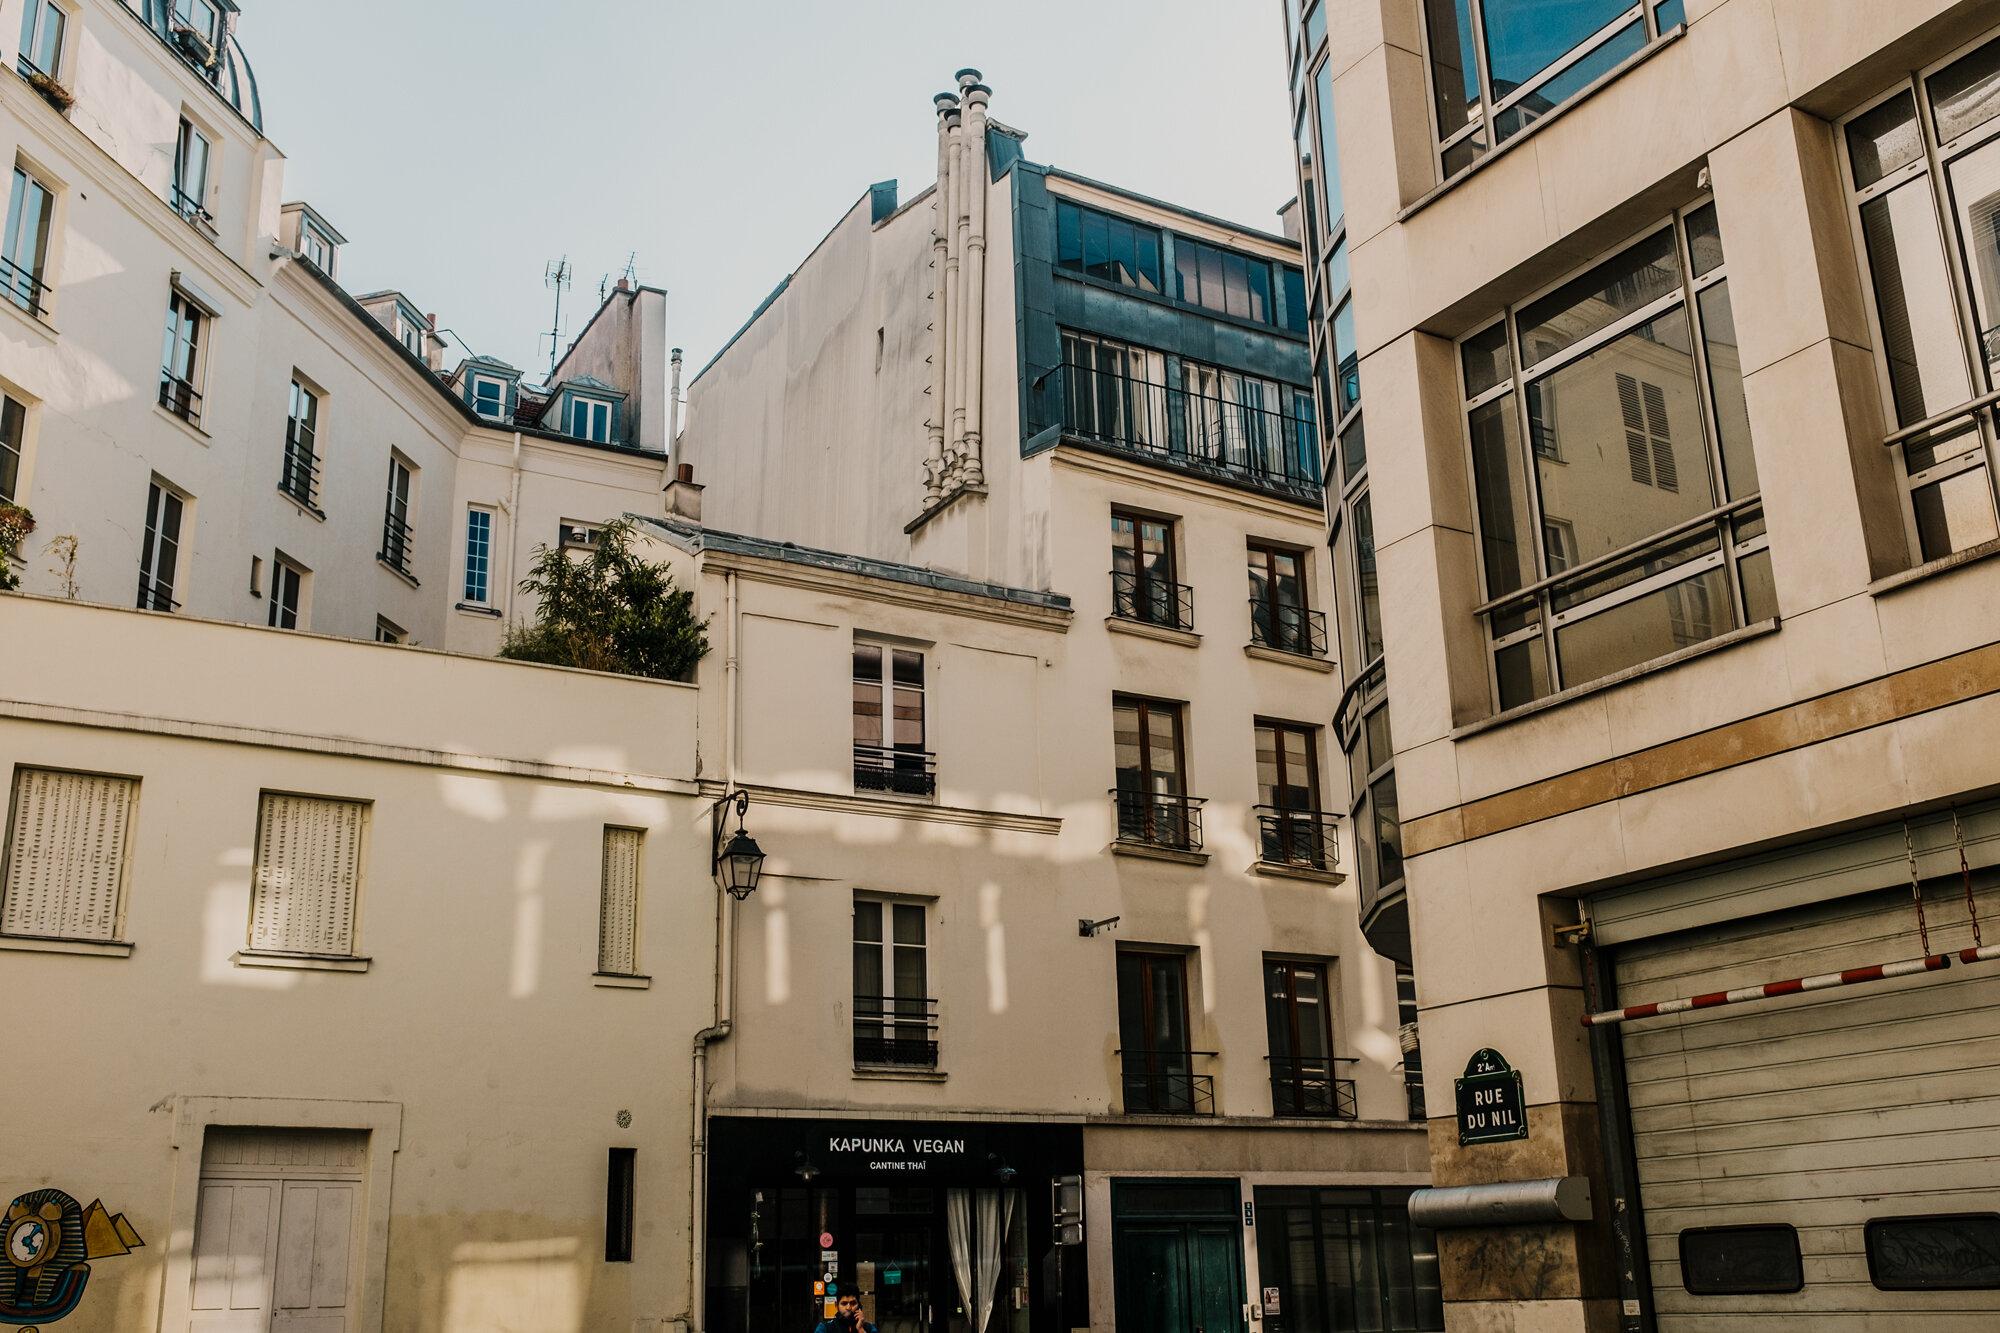 Paris_0013.jpg